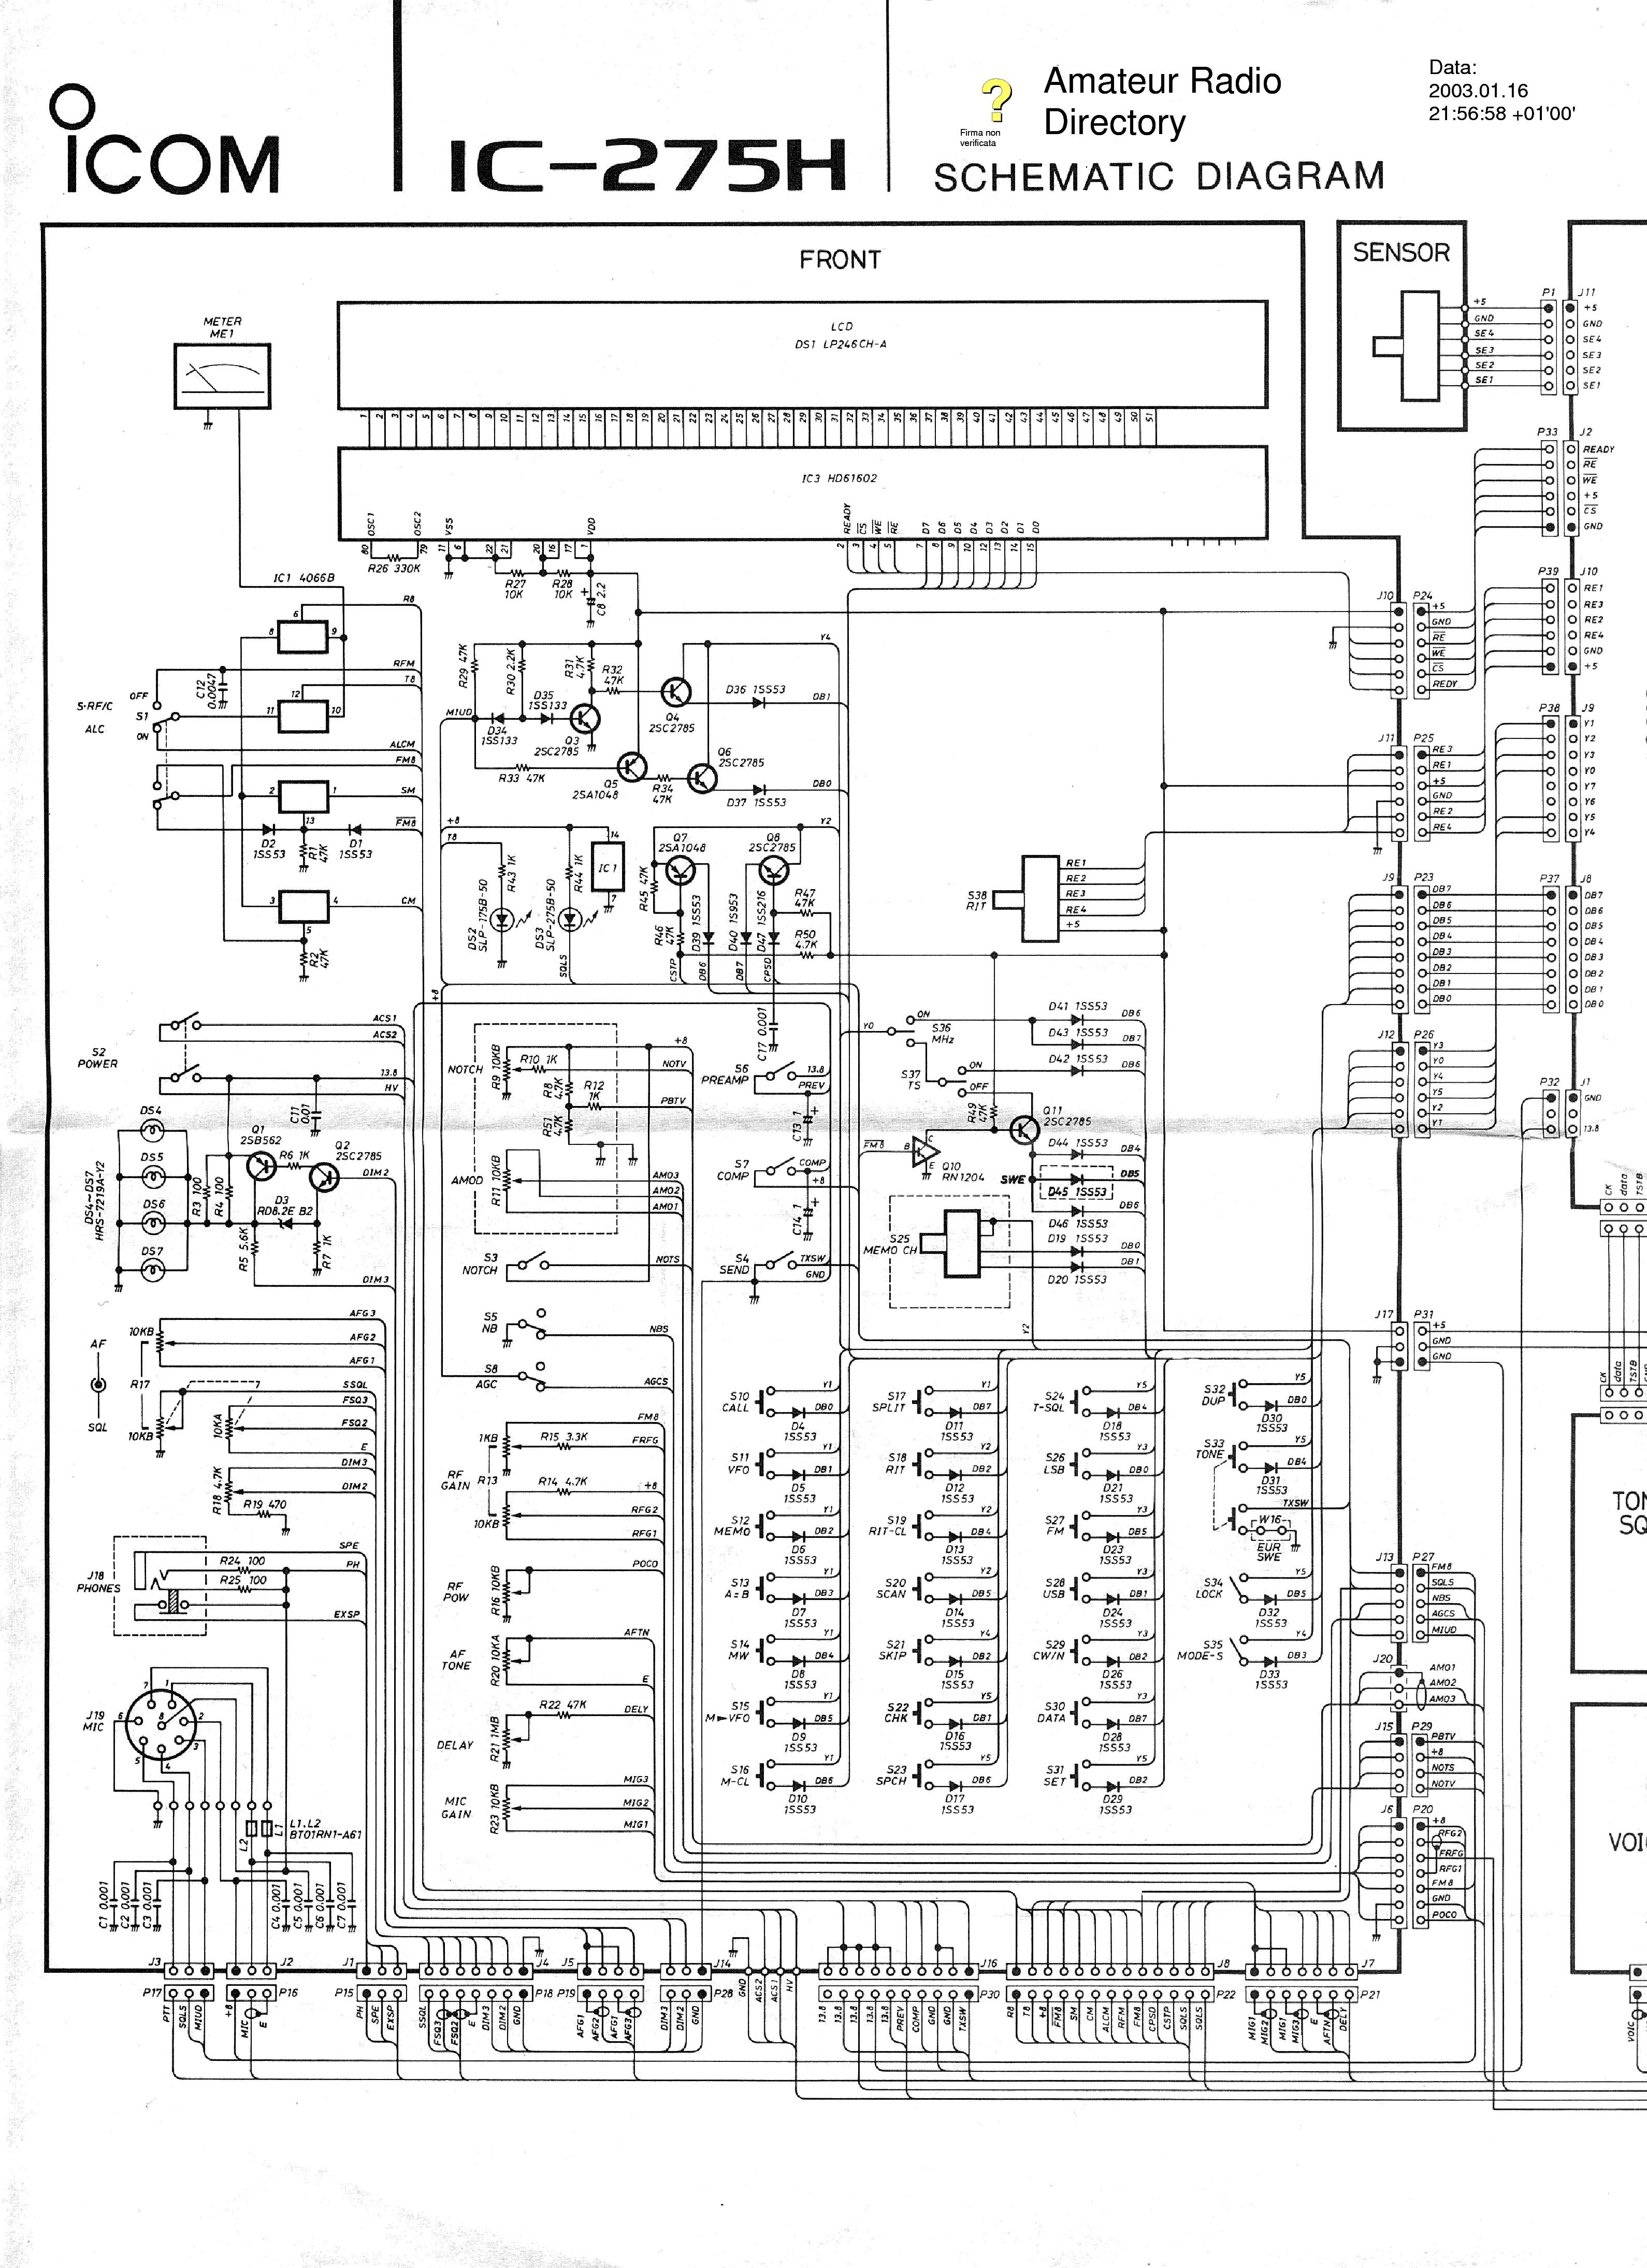 Icom ic 707 Service Manual